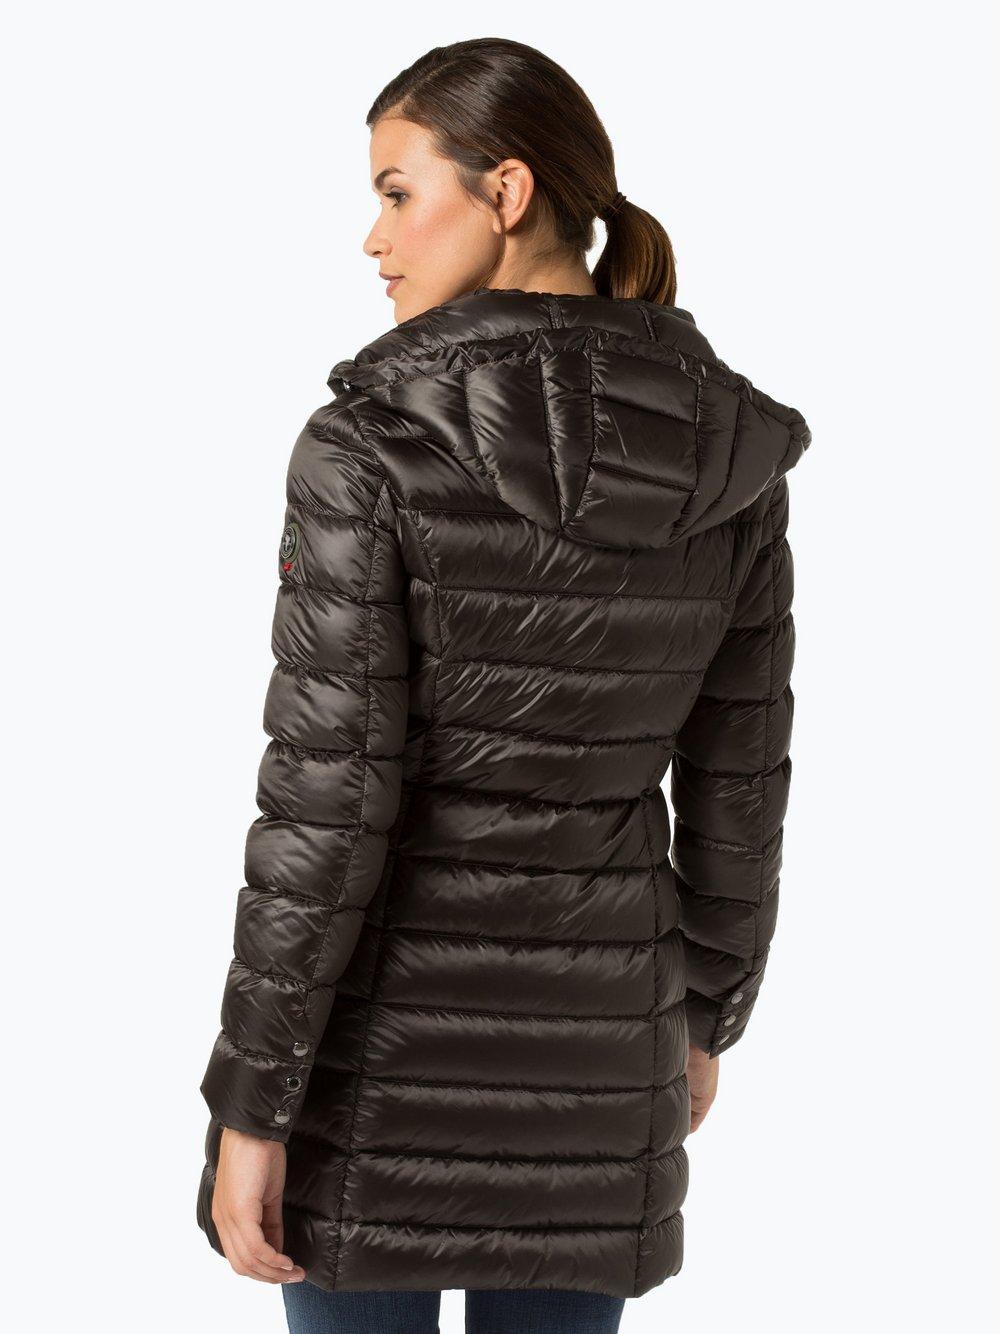 Cape Horn Damen Daunenmantel Blanca online kaufen